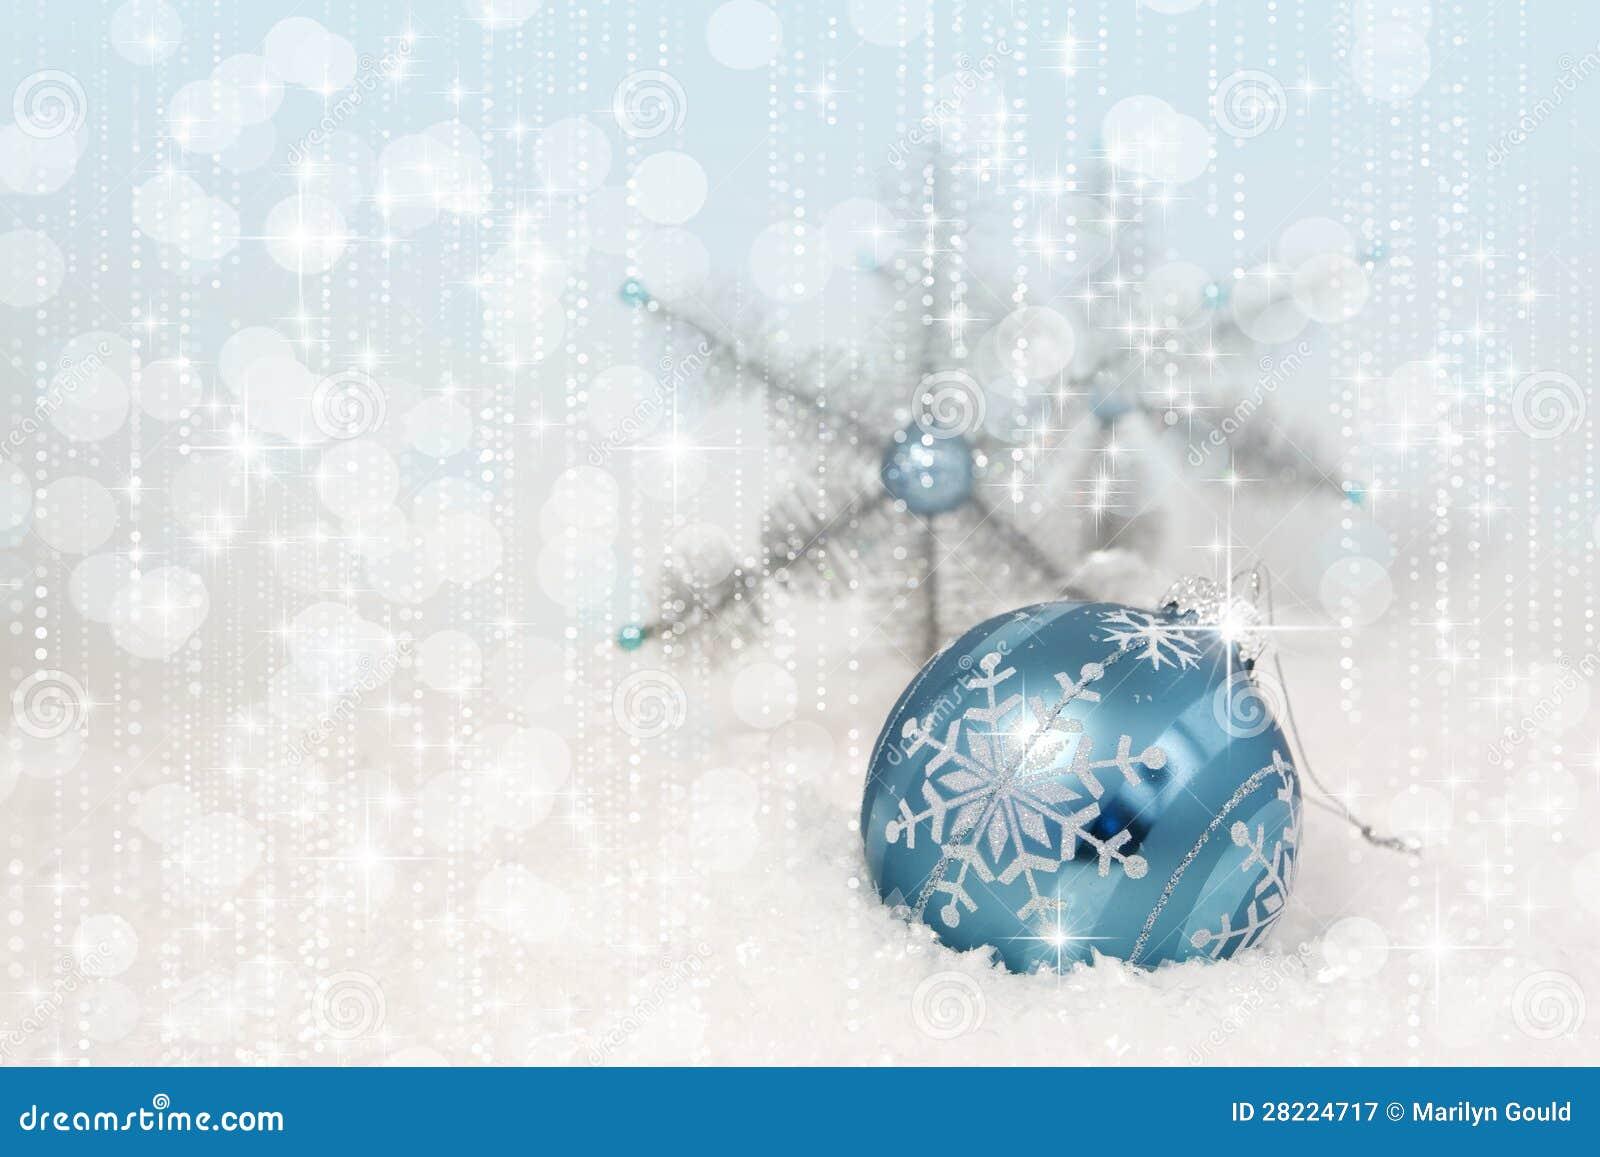 Blue Christmas Ornament Snowflakes